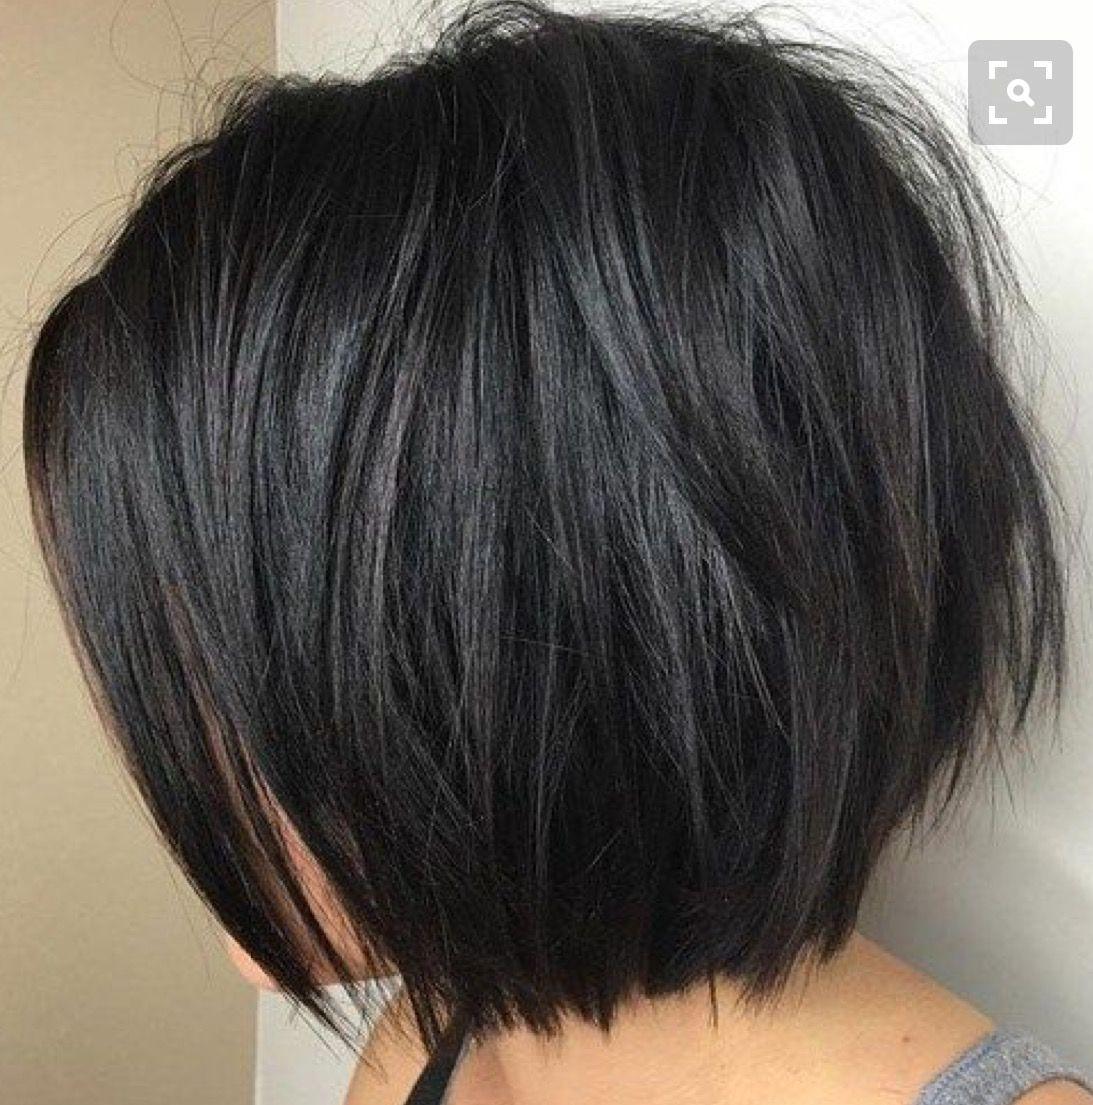 Via therighthairstyles hair pinterest hair style